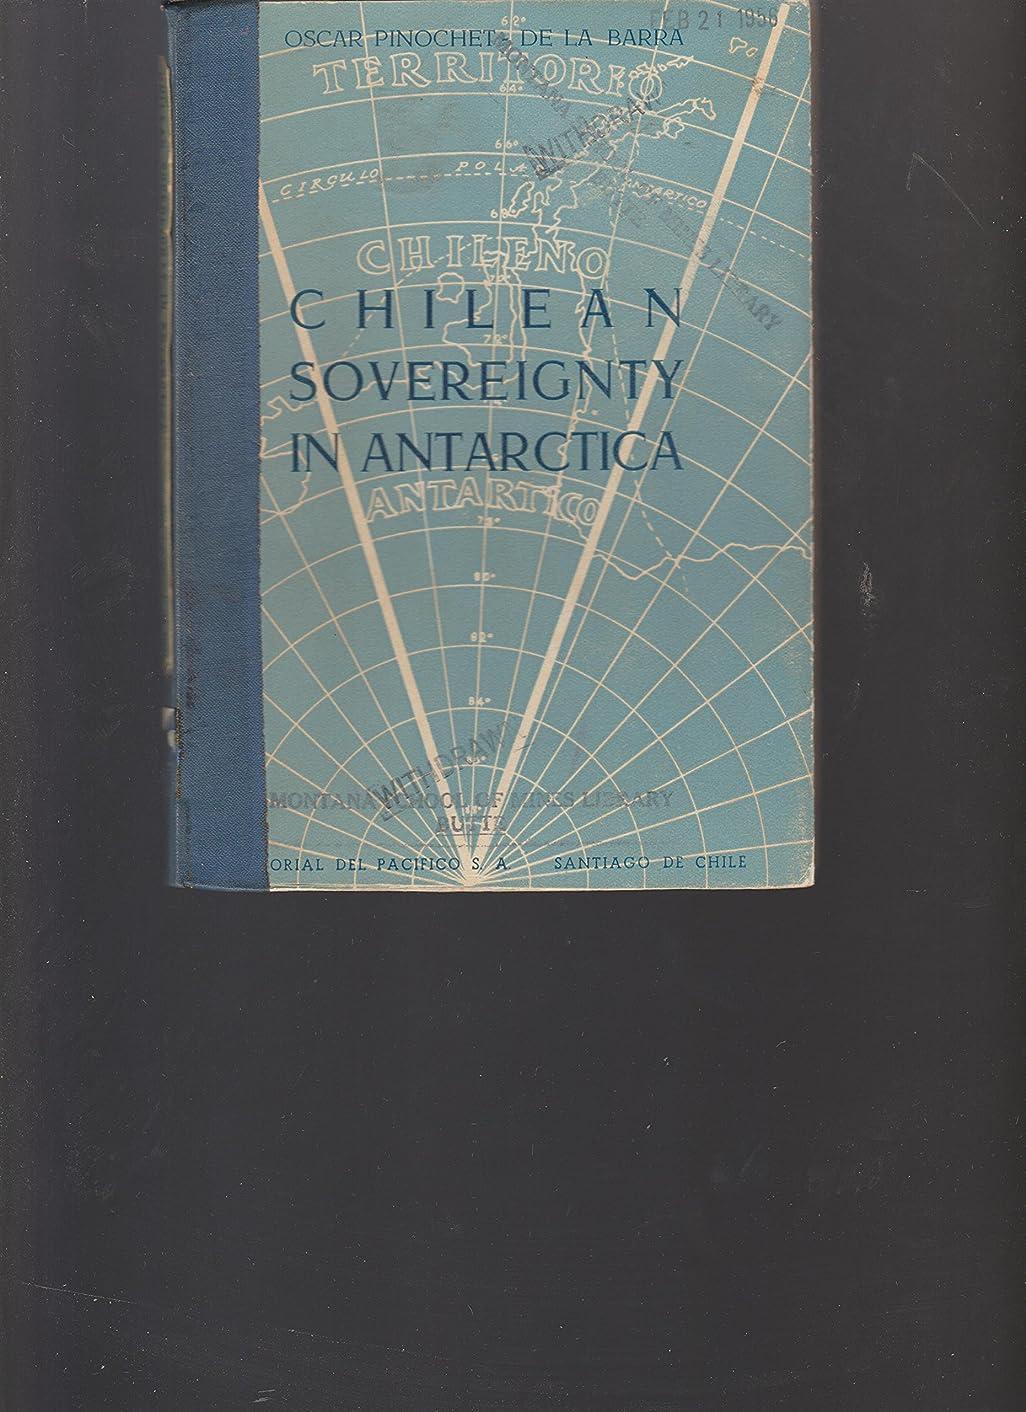 Chilean sovereignty in Antarctica